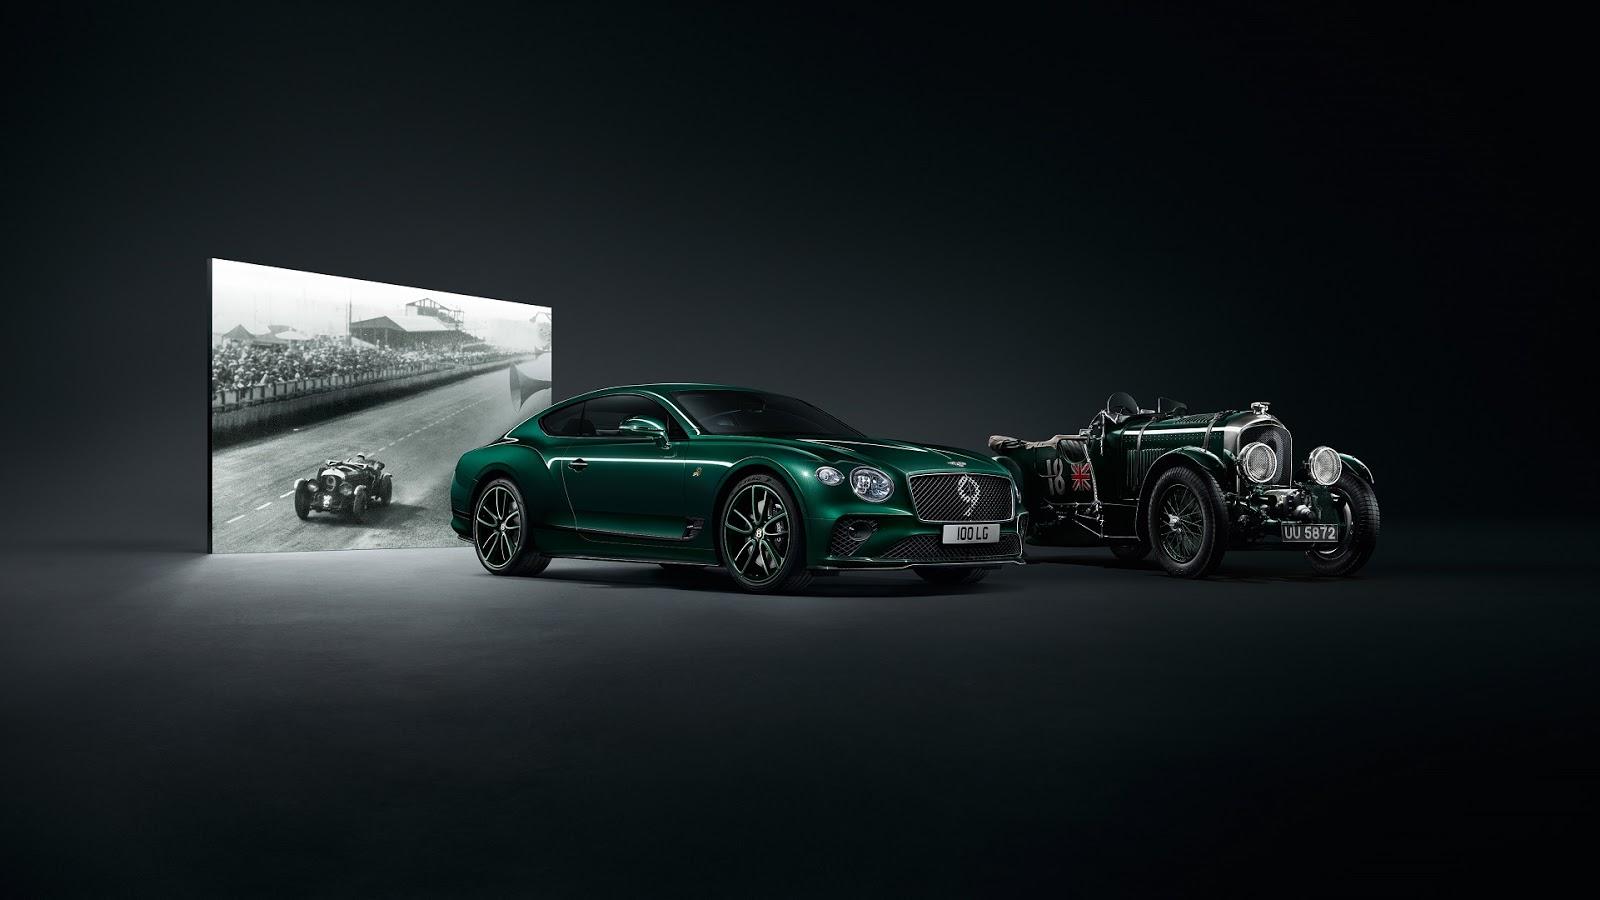 Bentley2BContinental2BGT2BNo2B92Bby2BMulliner2B 2B1 Αυτή η Bentley είναι το πιο πολυτελές GT του κόσμου!